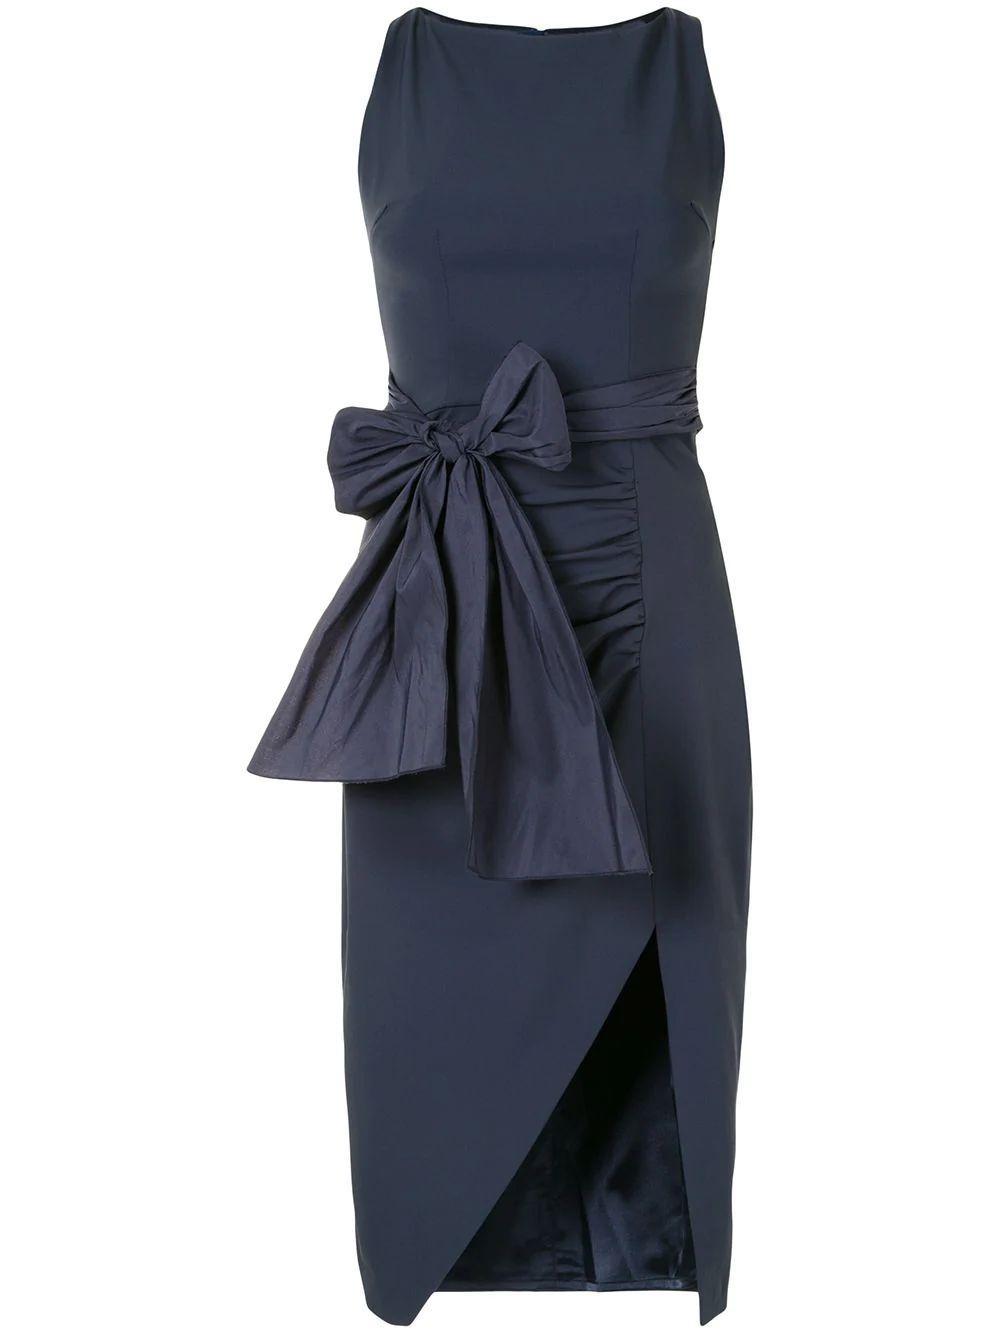 Slit Dress With Bow Belt Item # AB01806E2